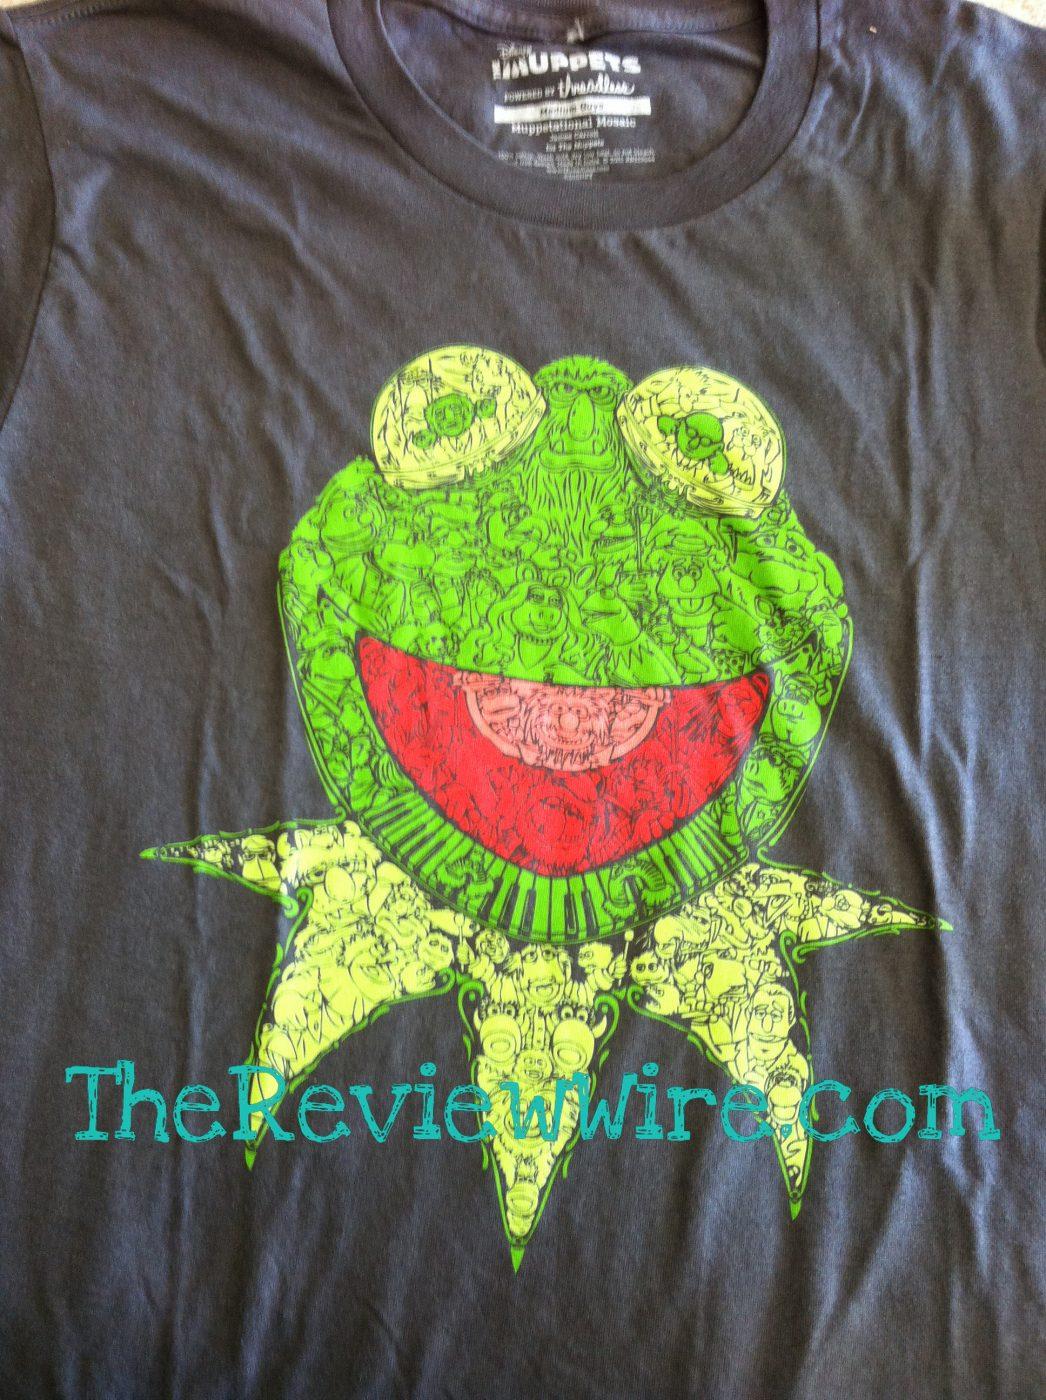 Muppets T Shirt Review